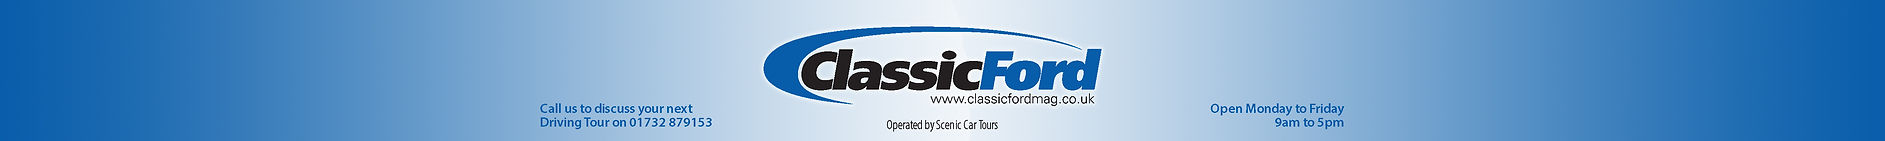 Classic Ford web header V2.jpg